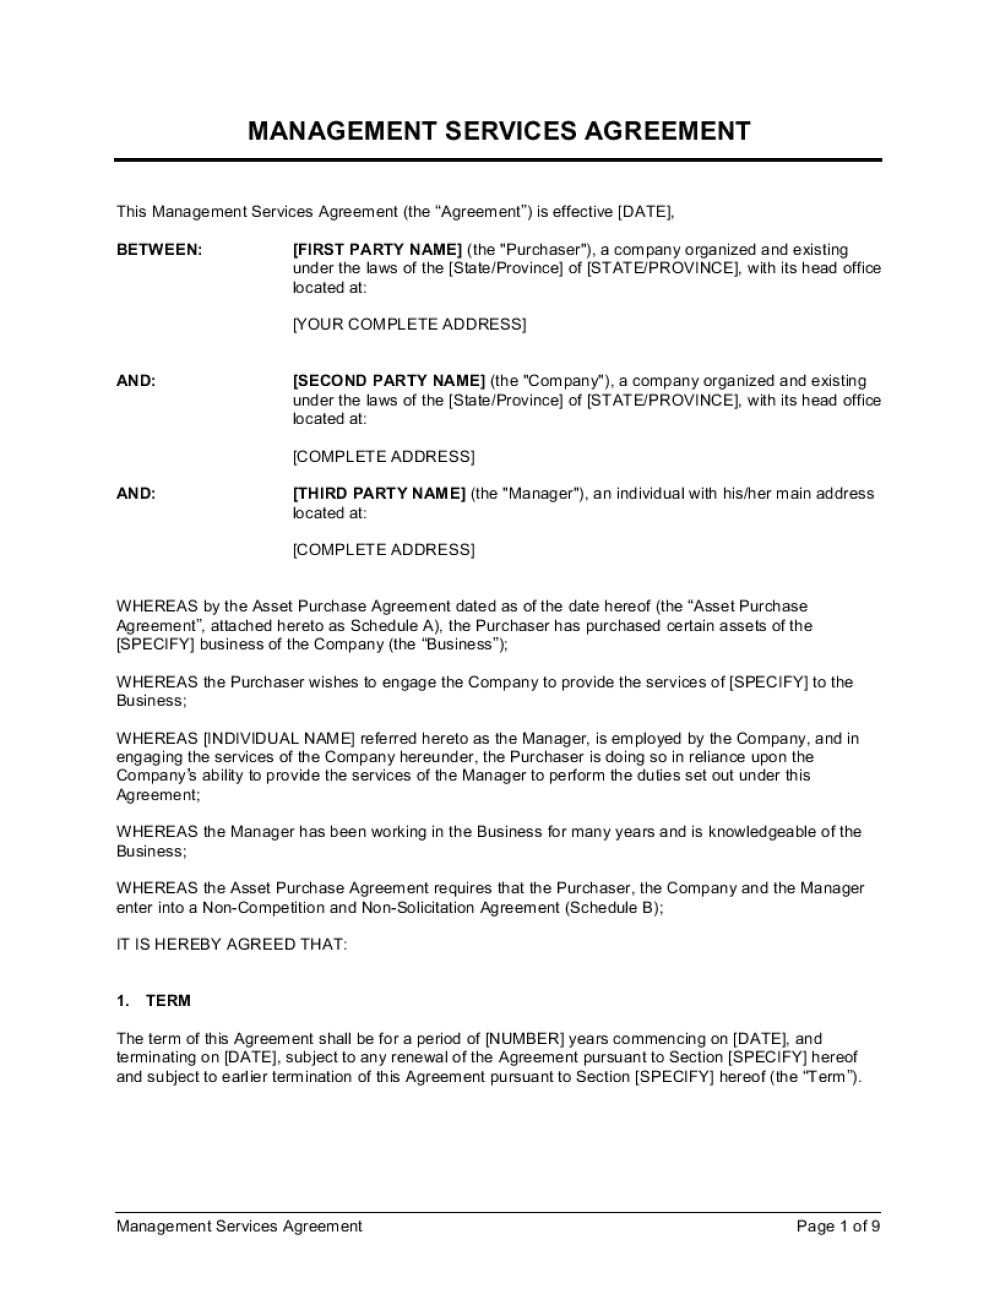 004 Breathtaking Master Service Agreement Template Design  Free AustraliaFull